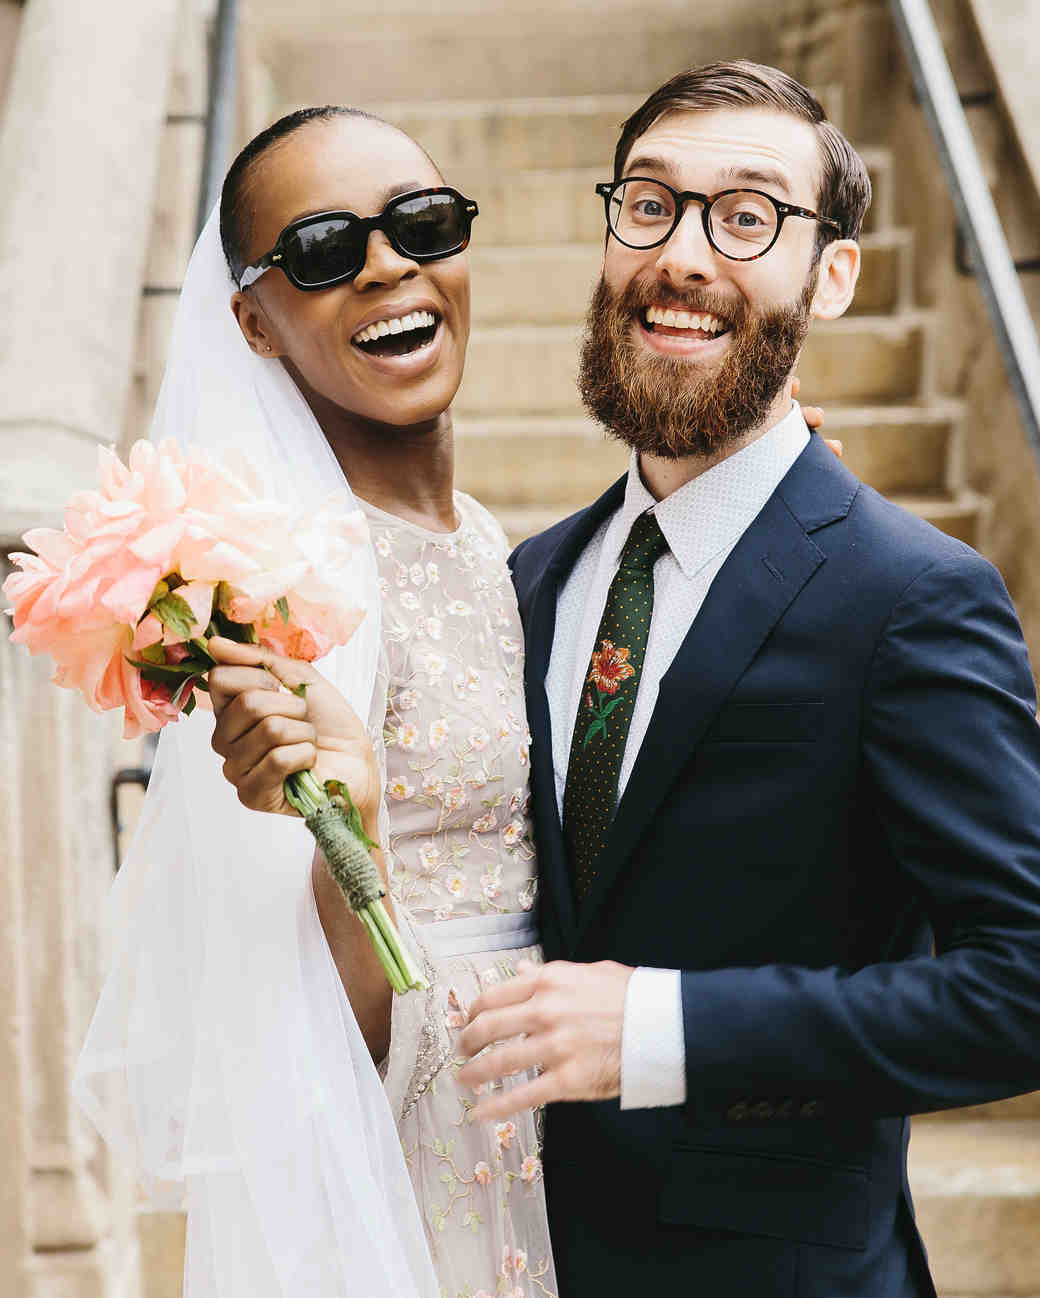 lola quinlan elopement couple smiles sunglasses